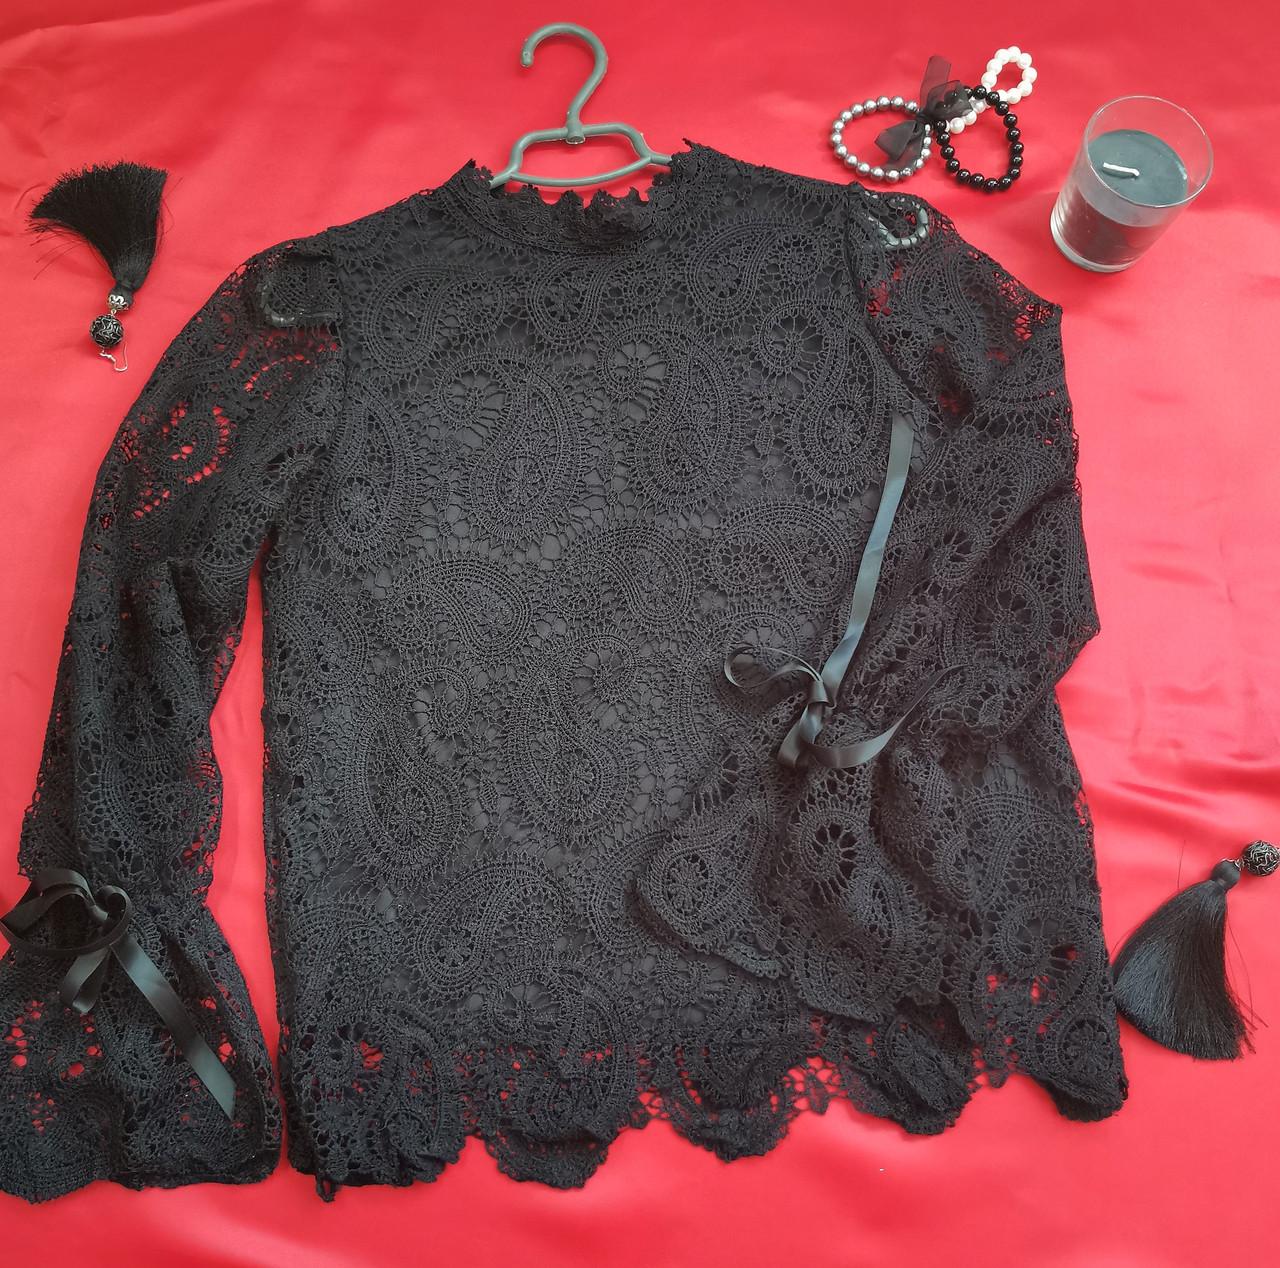 Кружевная черная женская блуза